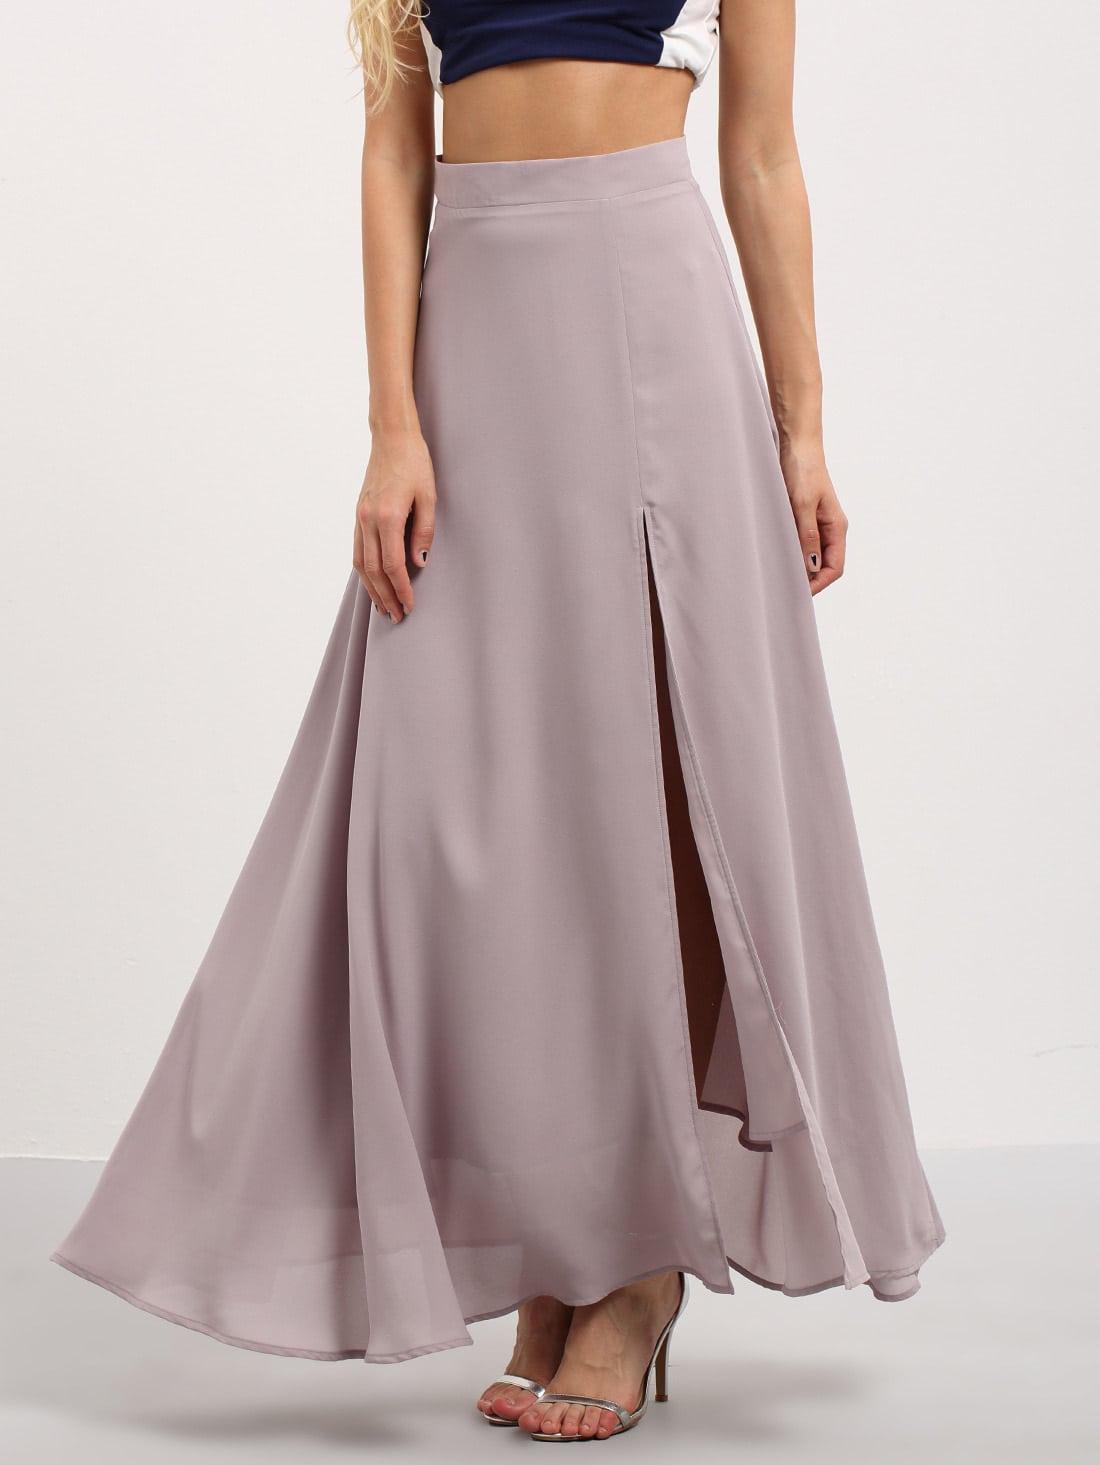 purple split chiffon maxi skirt. Black Bedroom Furniture Sets. Home Design Ideas